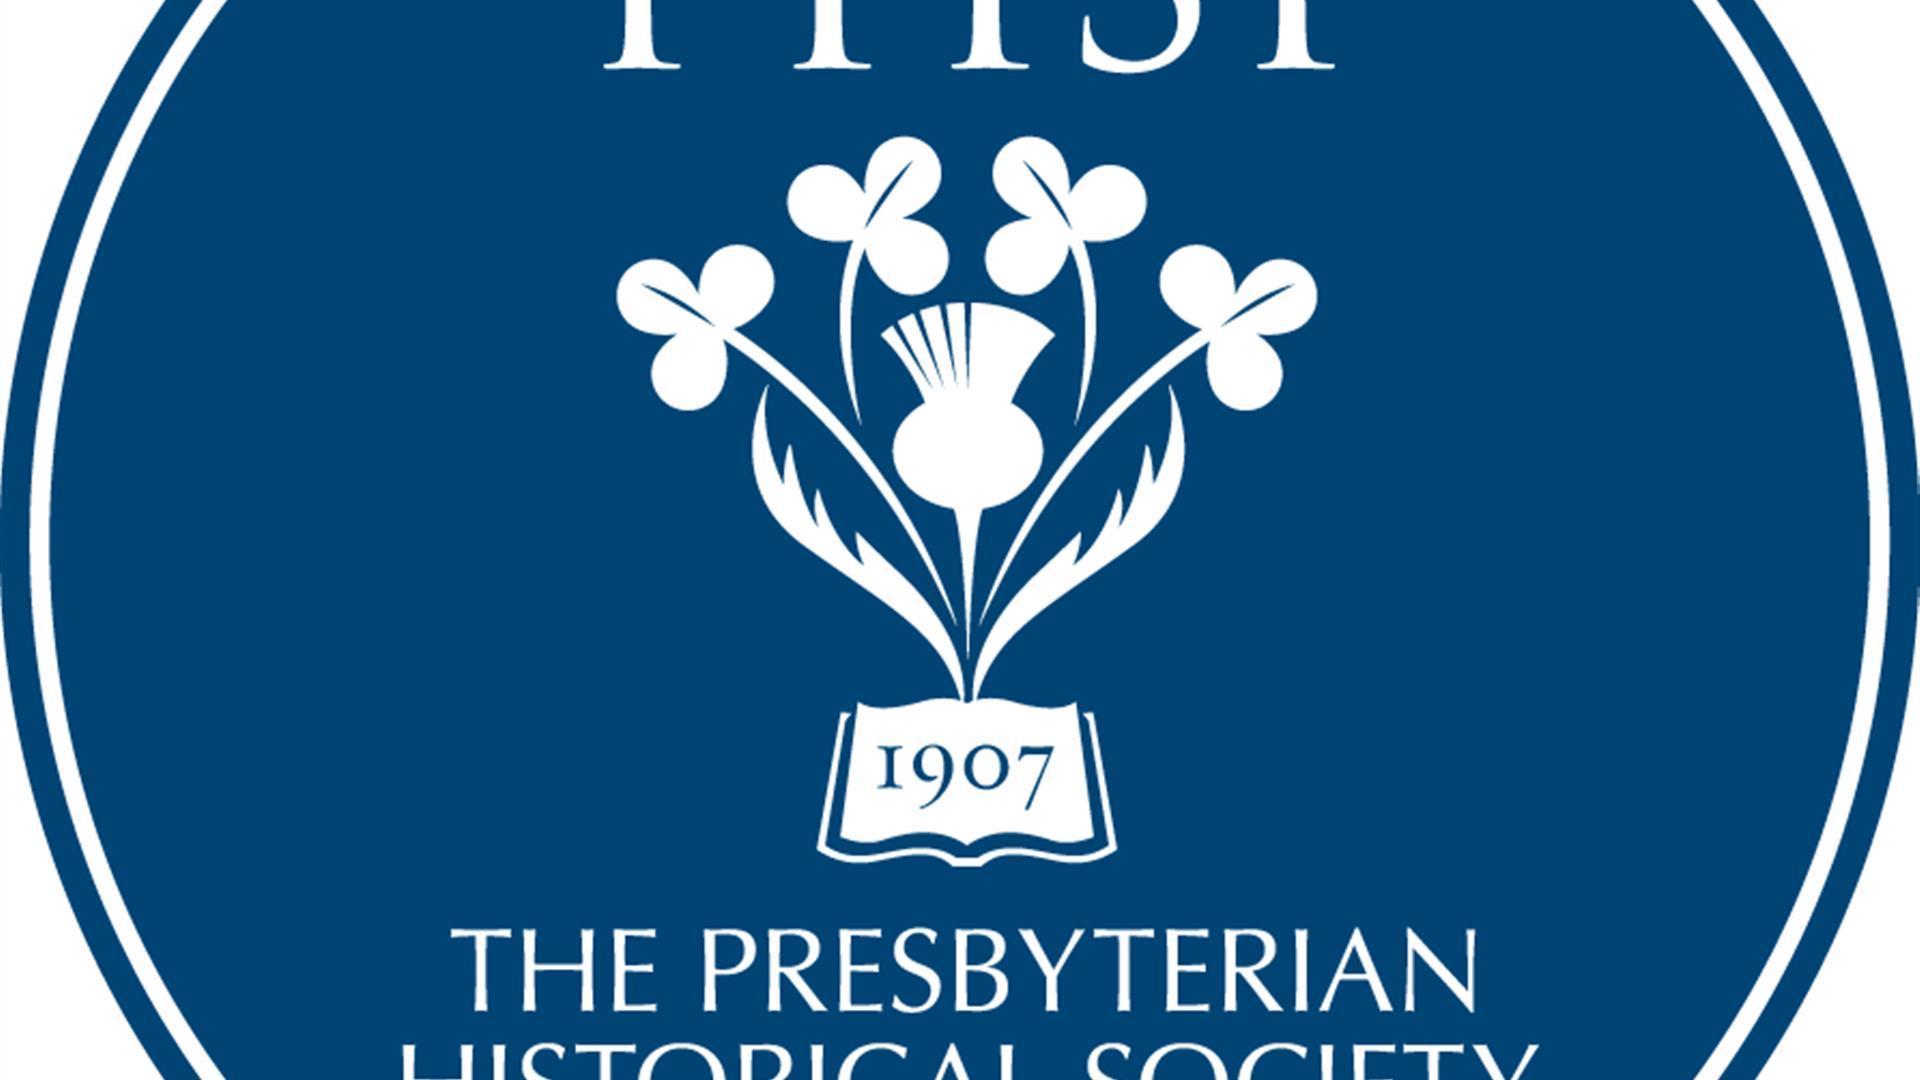 Presbyterian Historical Society of Ireland